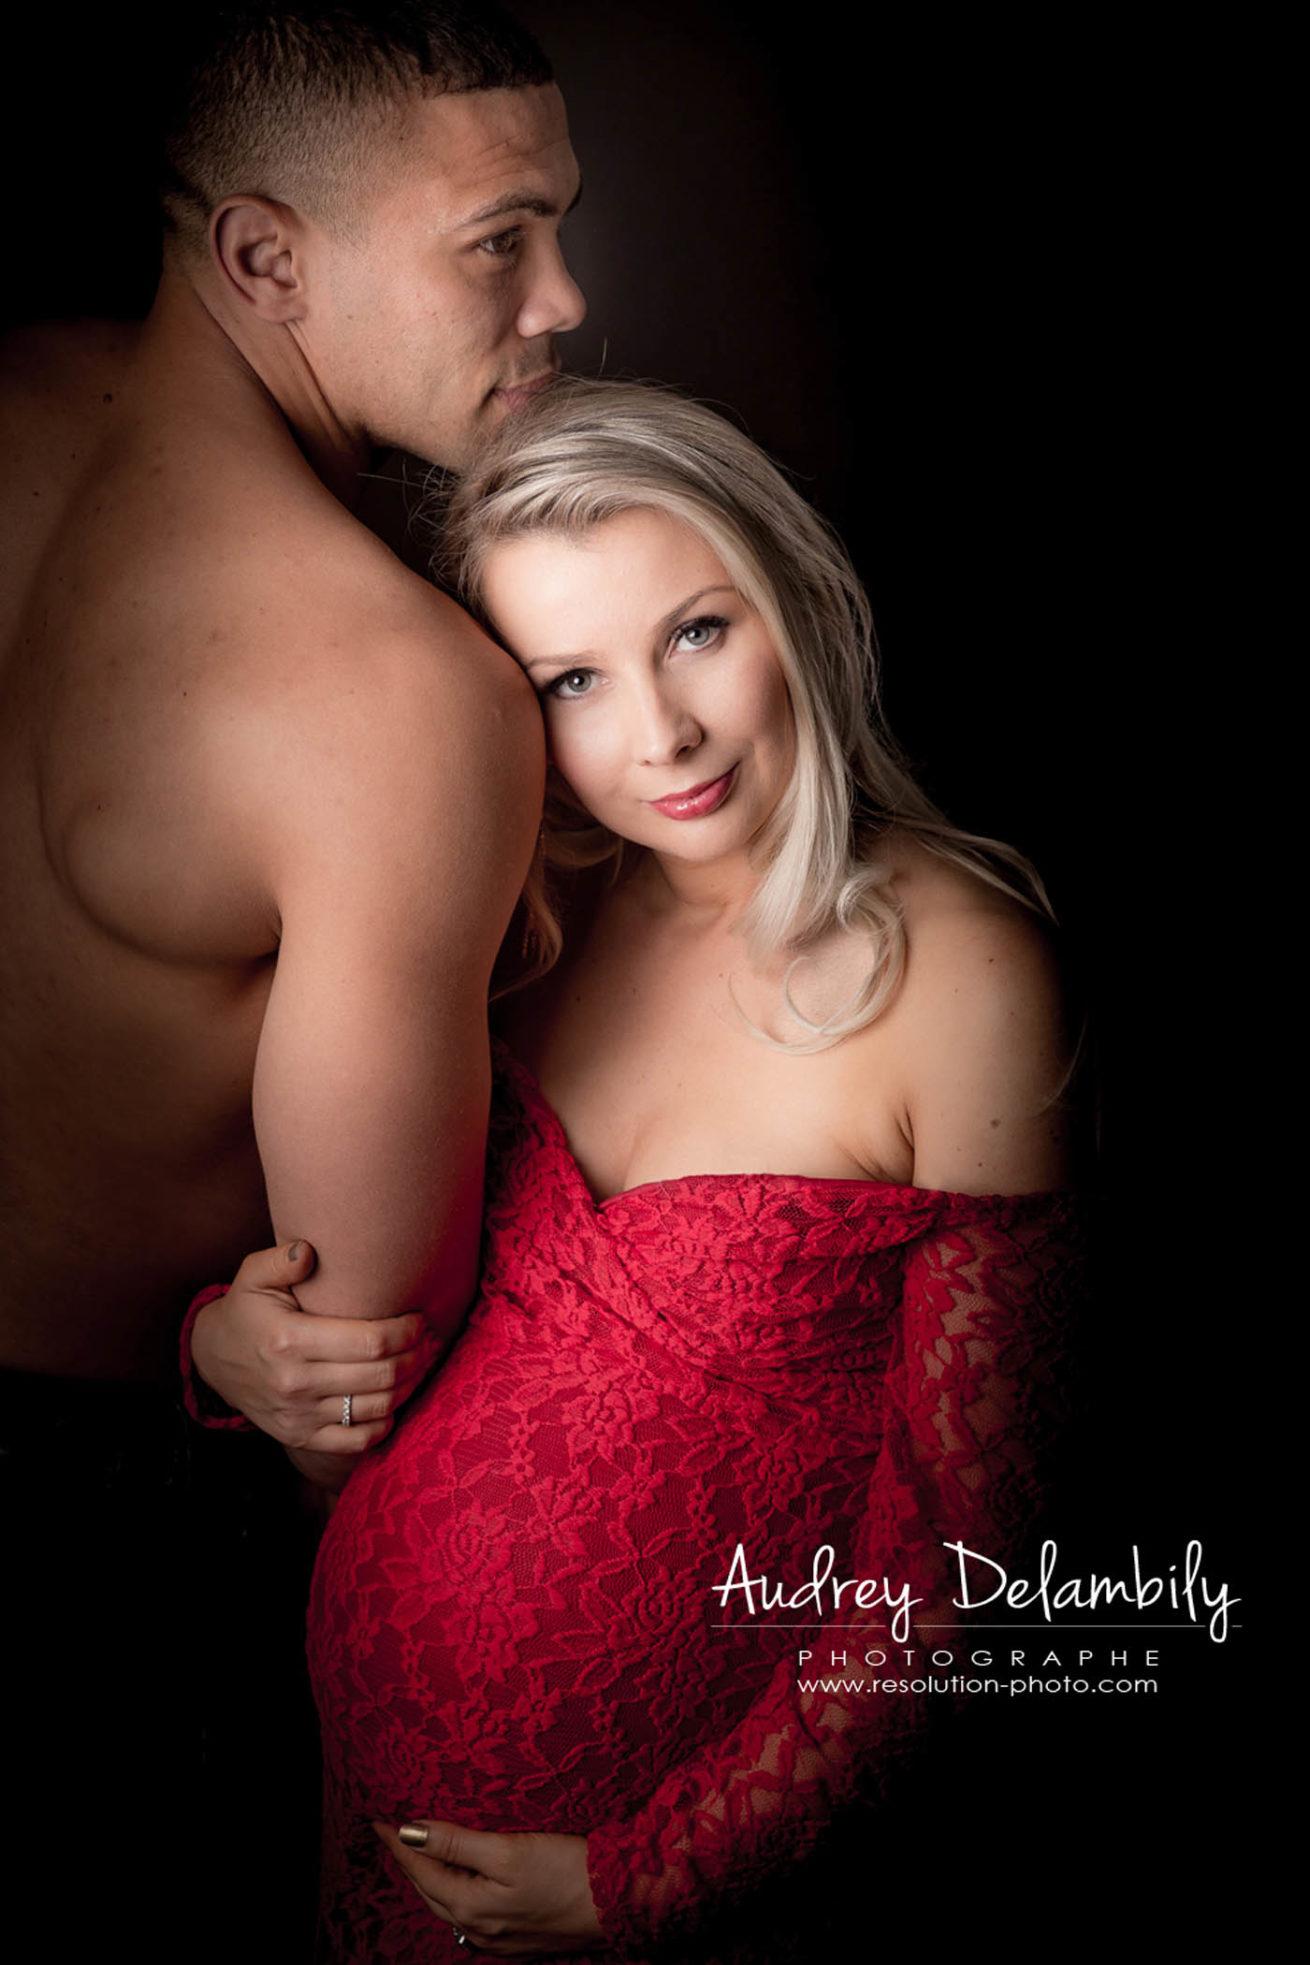 photographe-femme-enceinte-grossesse-studio-toulon-var-bryan-habana